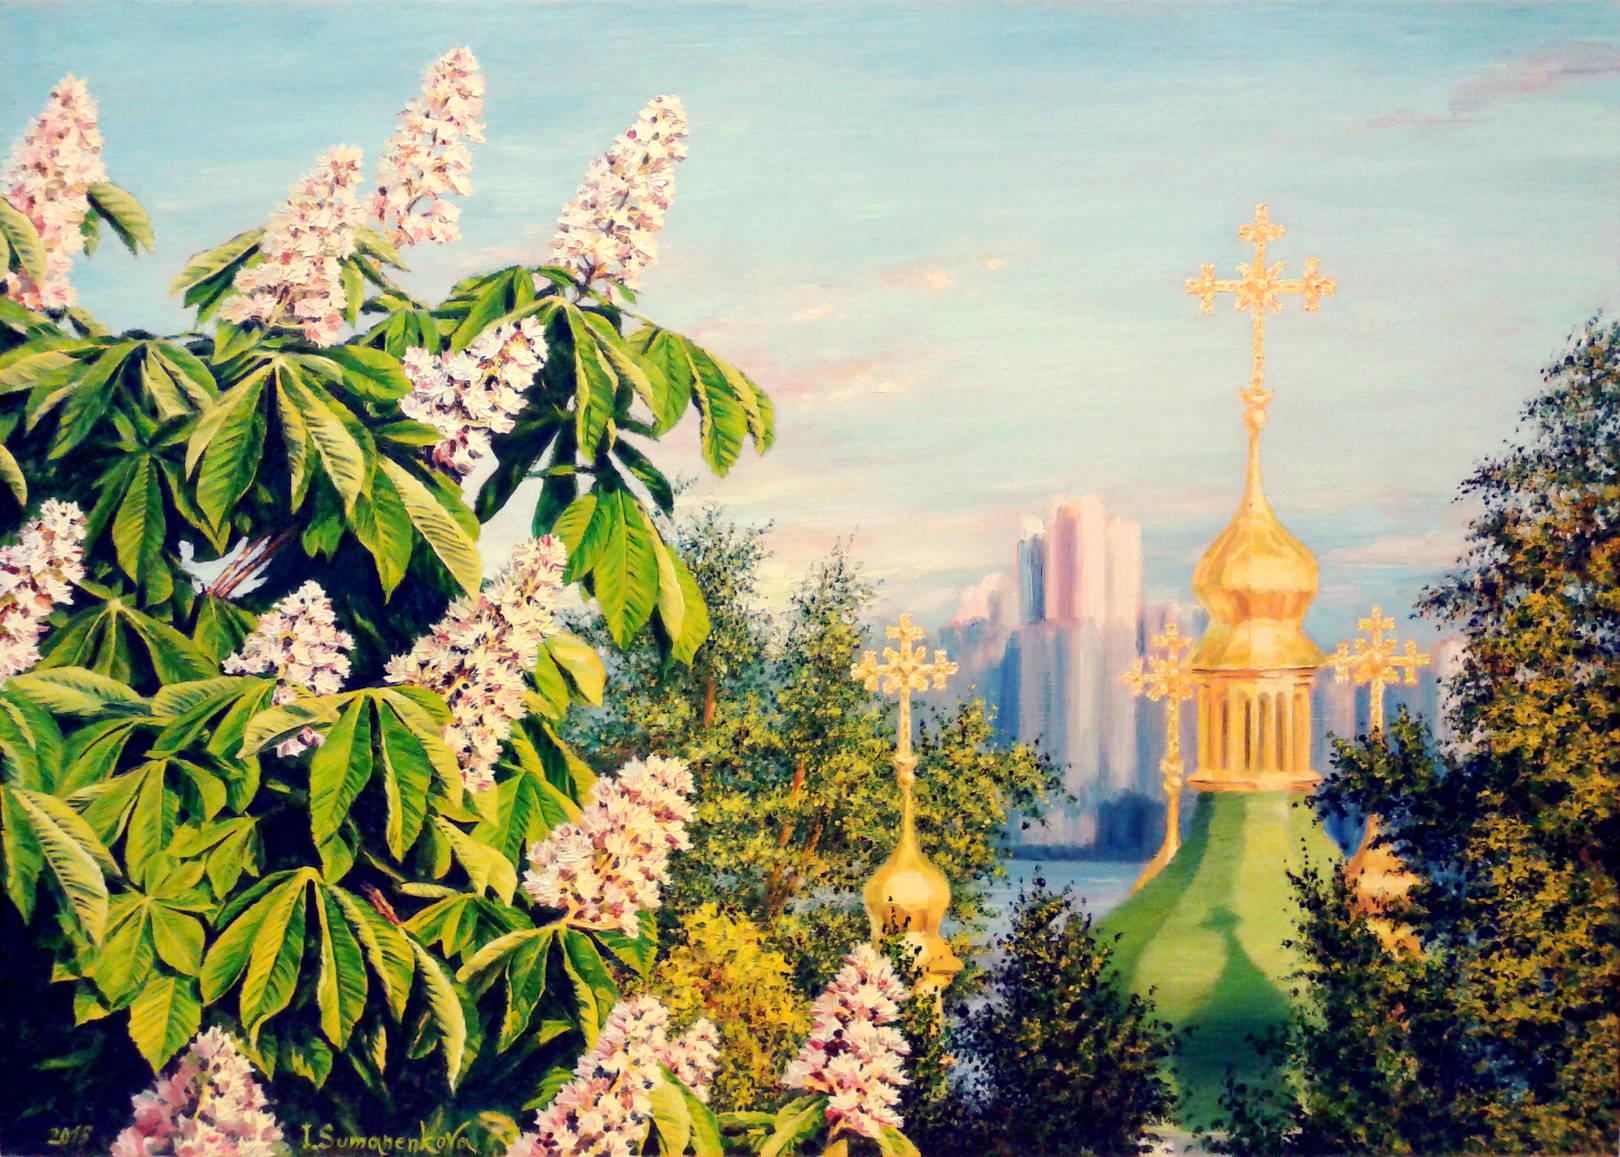 Мечта о Киеве / Dreaming about Кyiv 50 х 70 см, холст, масло, 2015 г